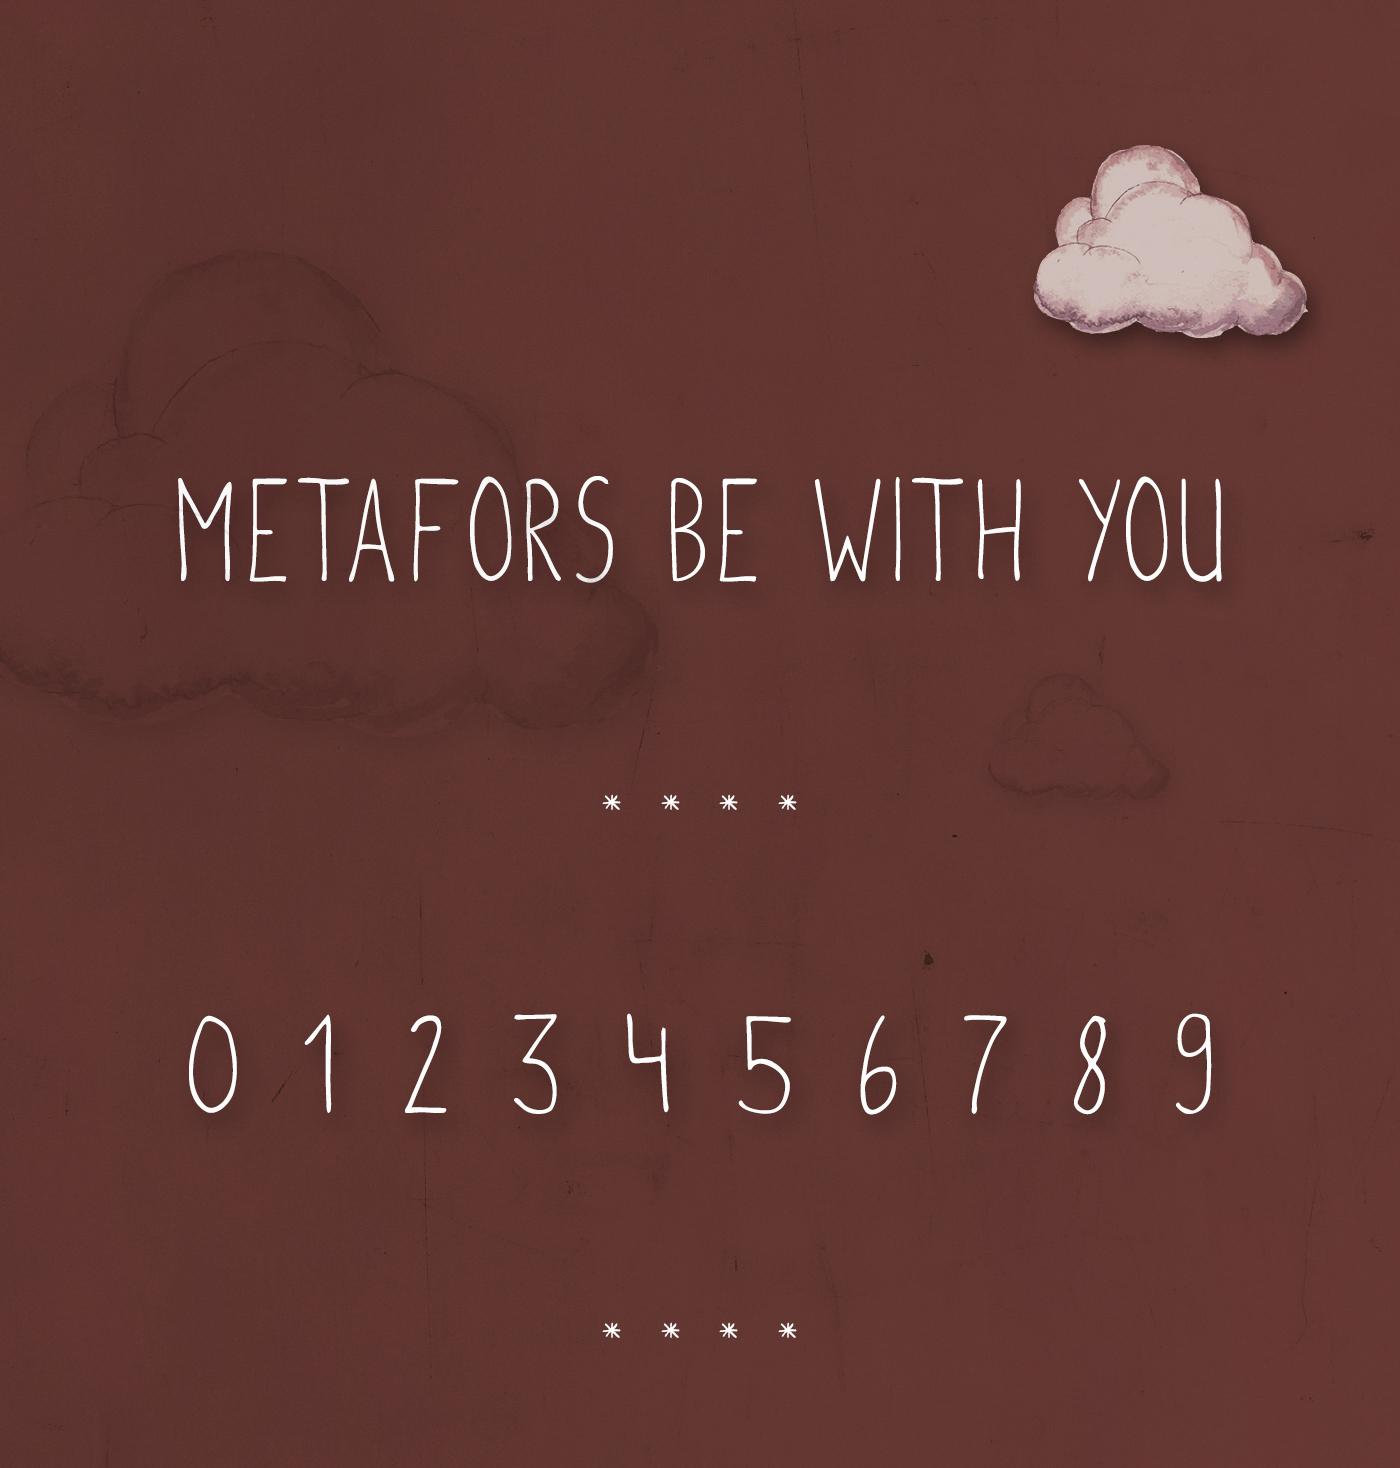 metafors 12